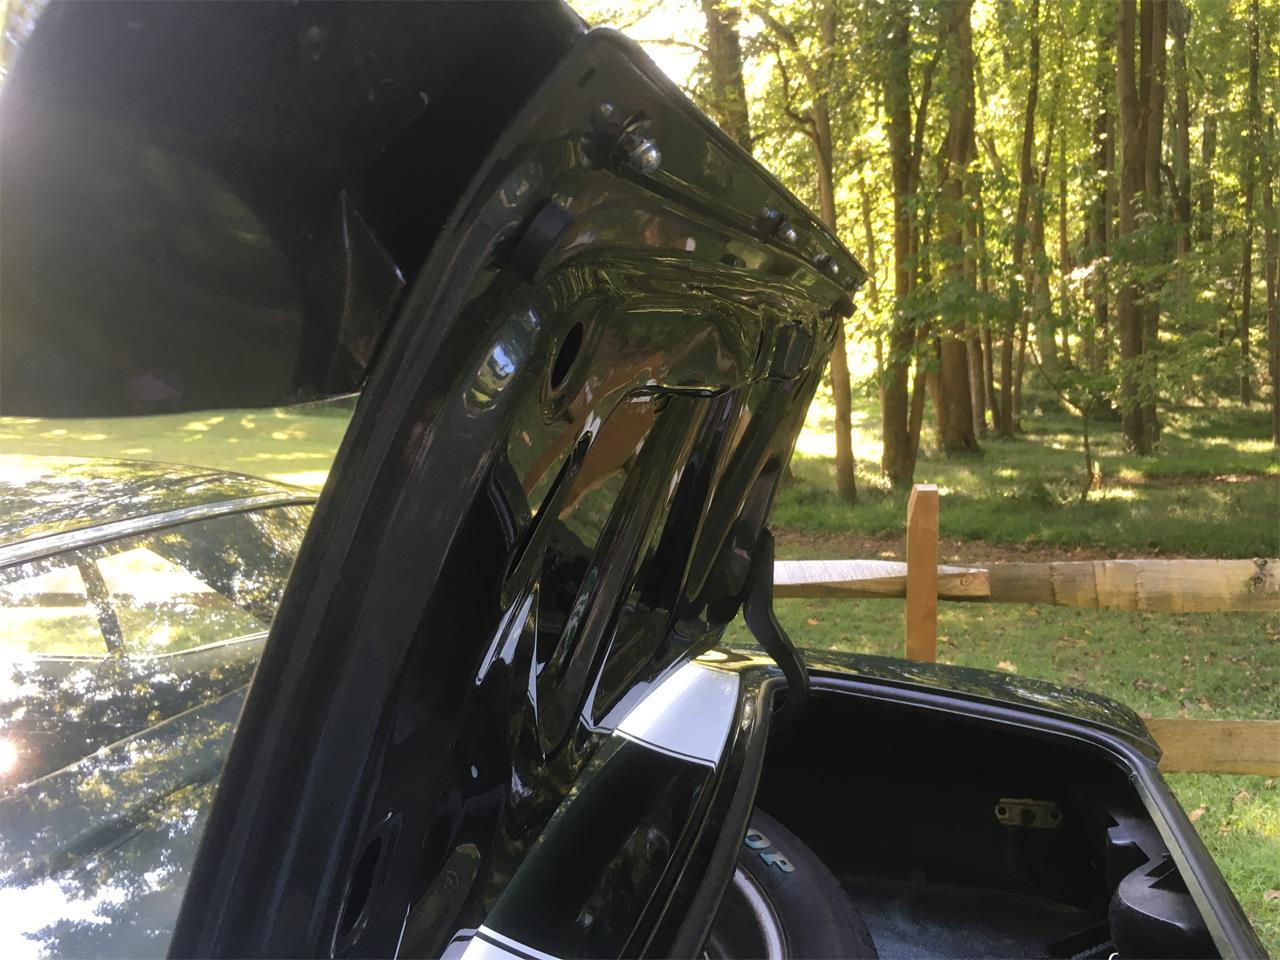 1969 Chevrolet Camaro Z28 (CC-1132945) for sale in Sykesville, Maryland